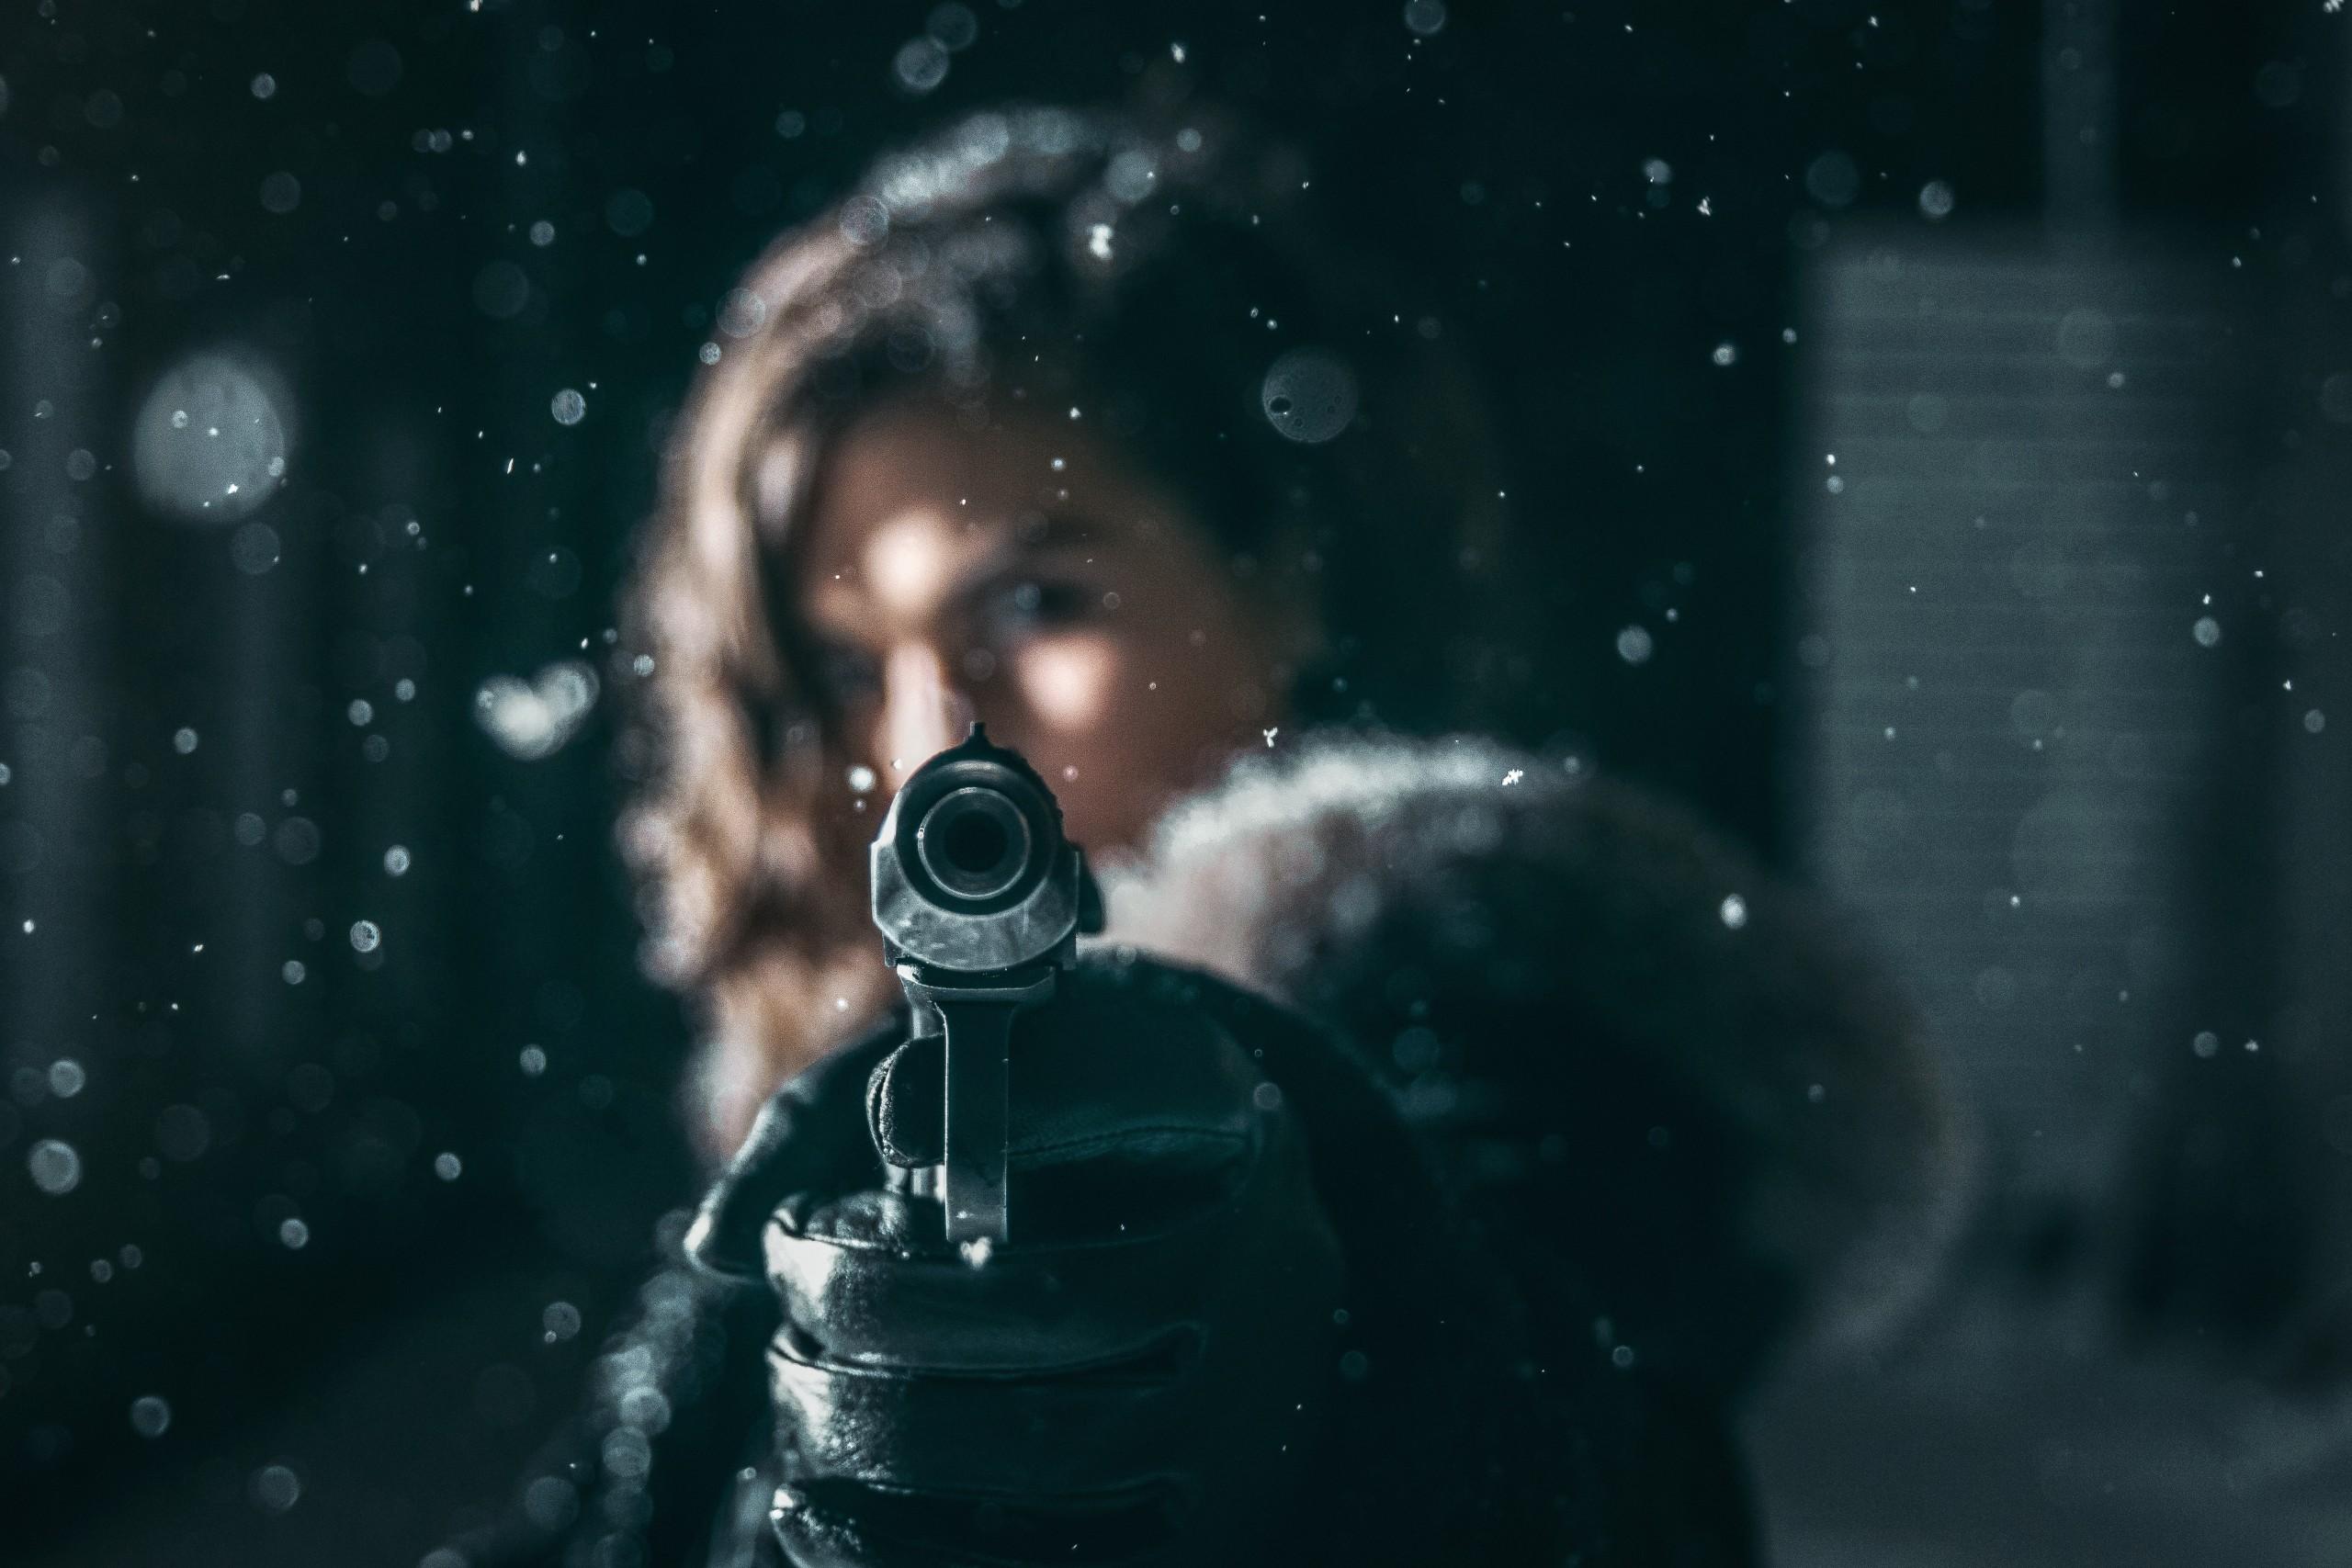 Pistol in prim-plan tinut de o fata